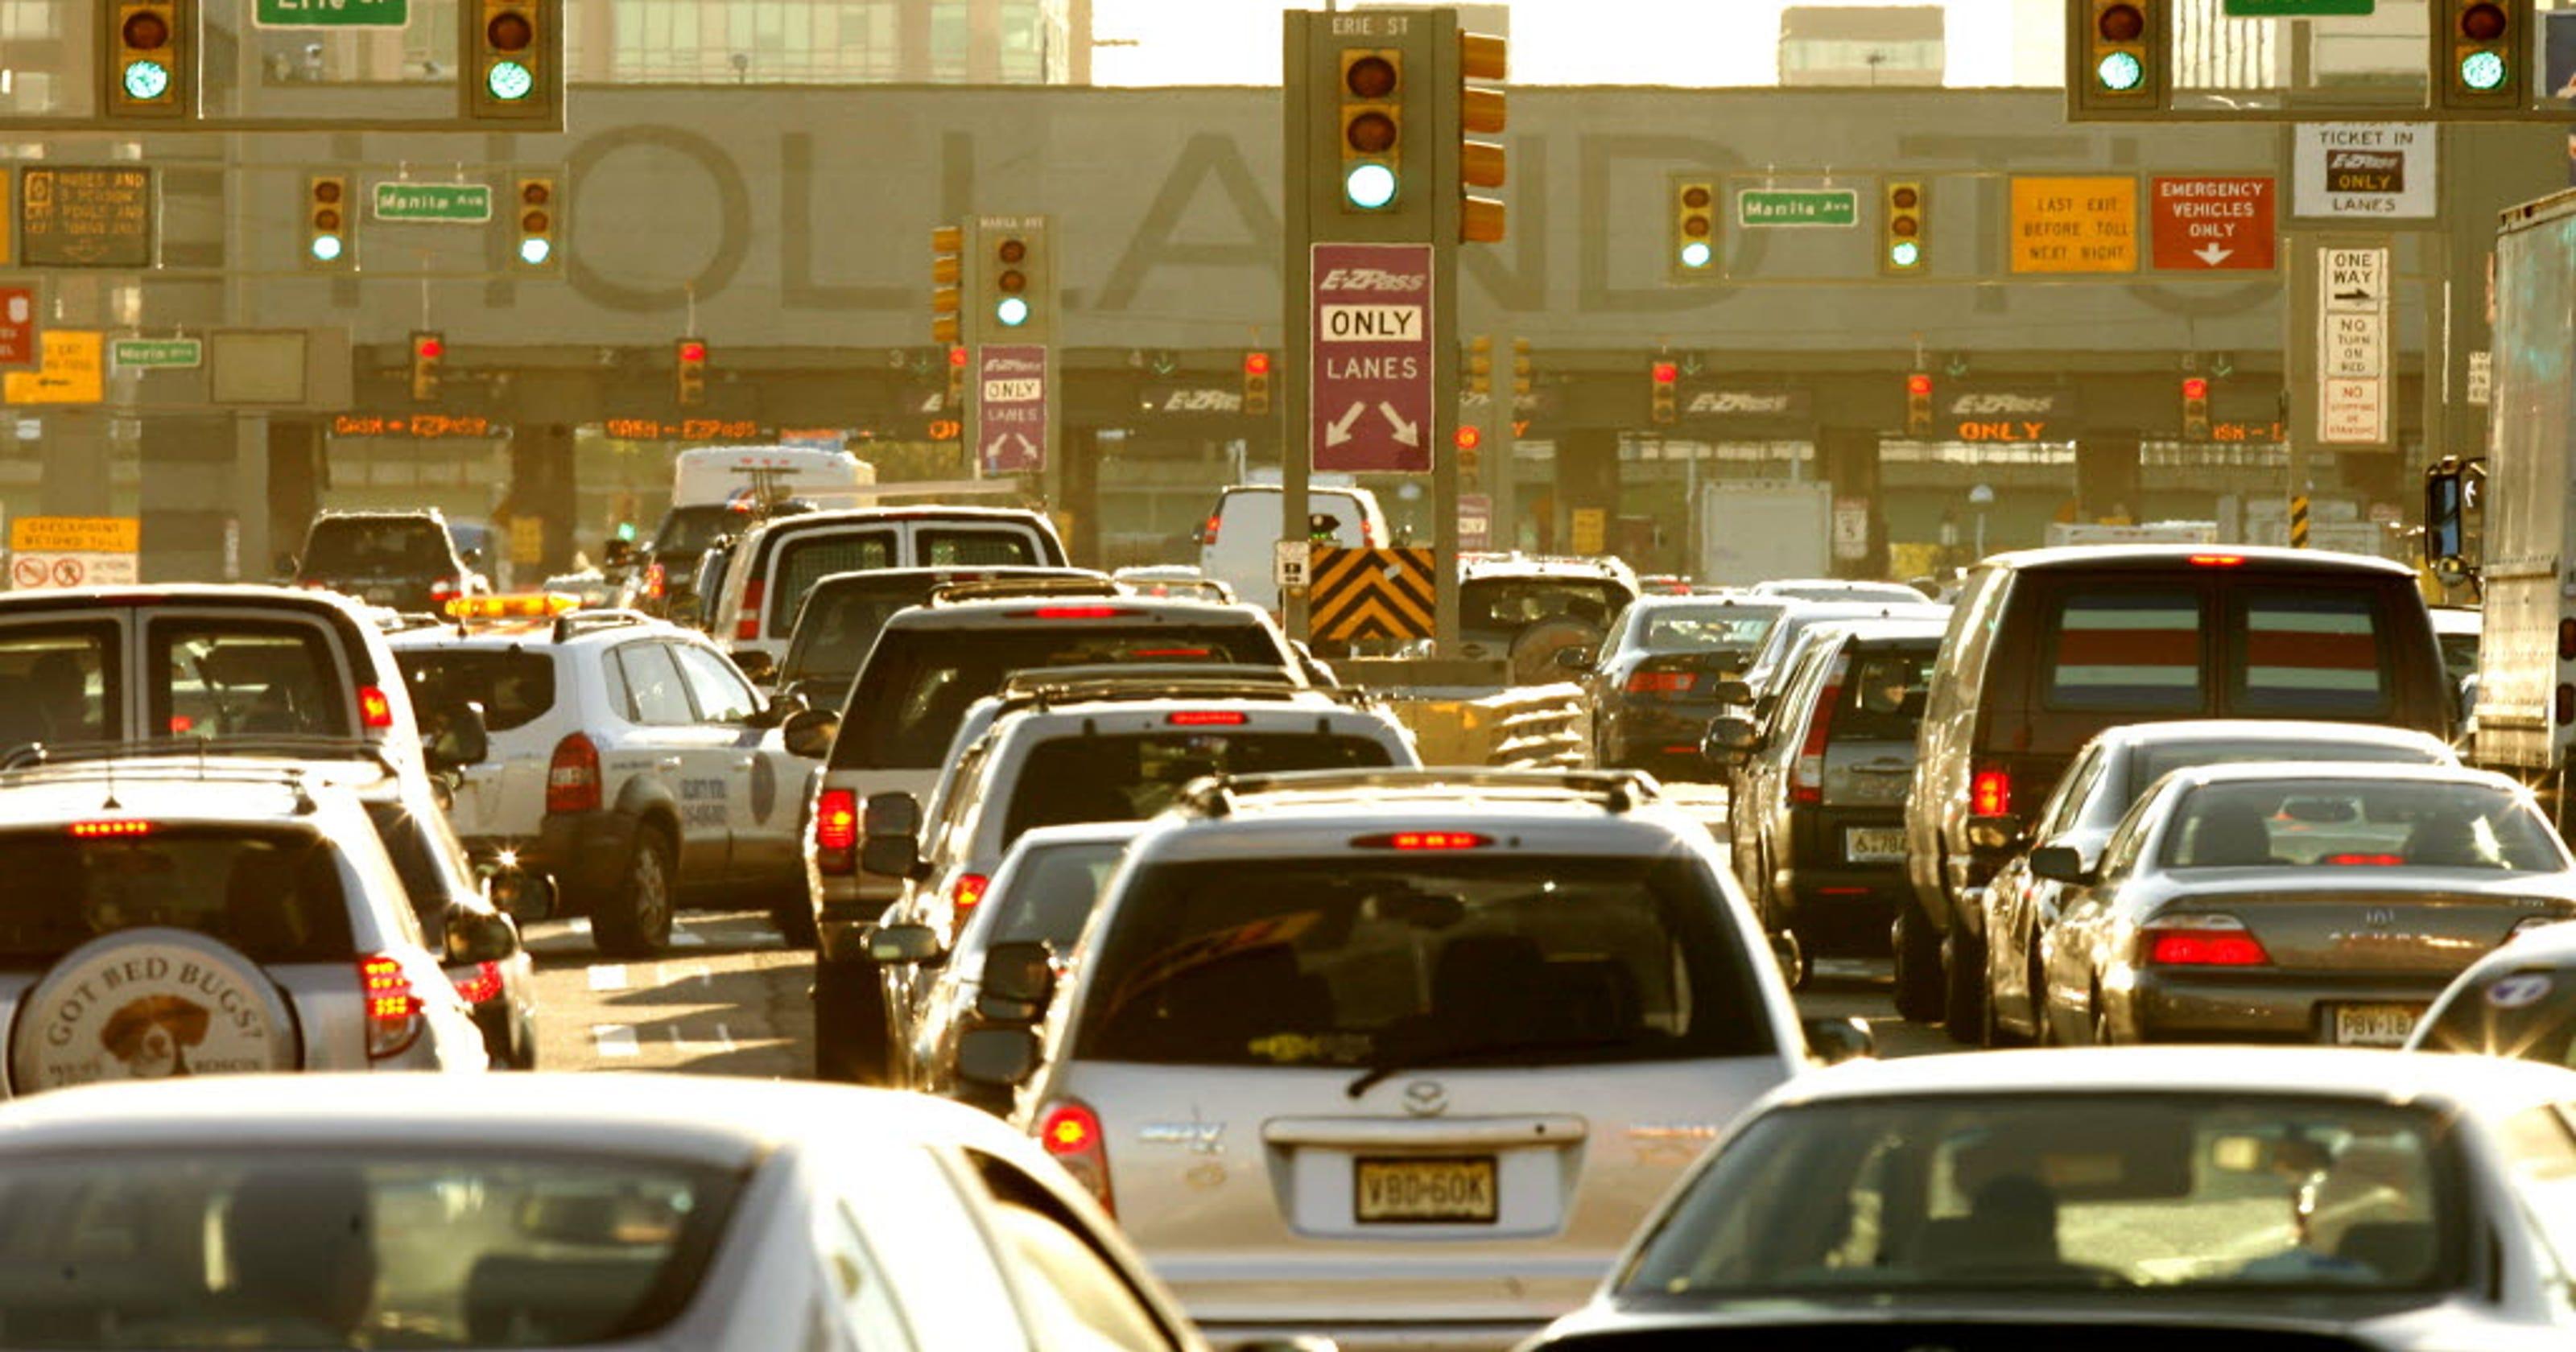 NJ traffic: Garden State Parkway accident slows Saddle Brook traffic